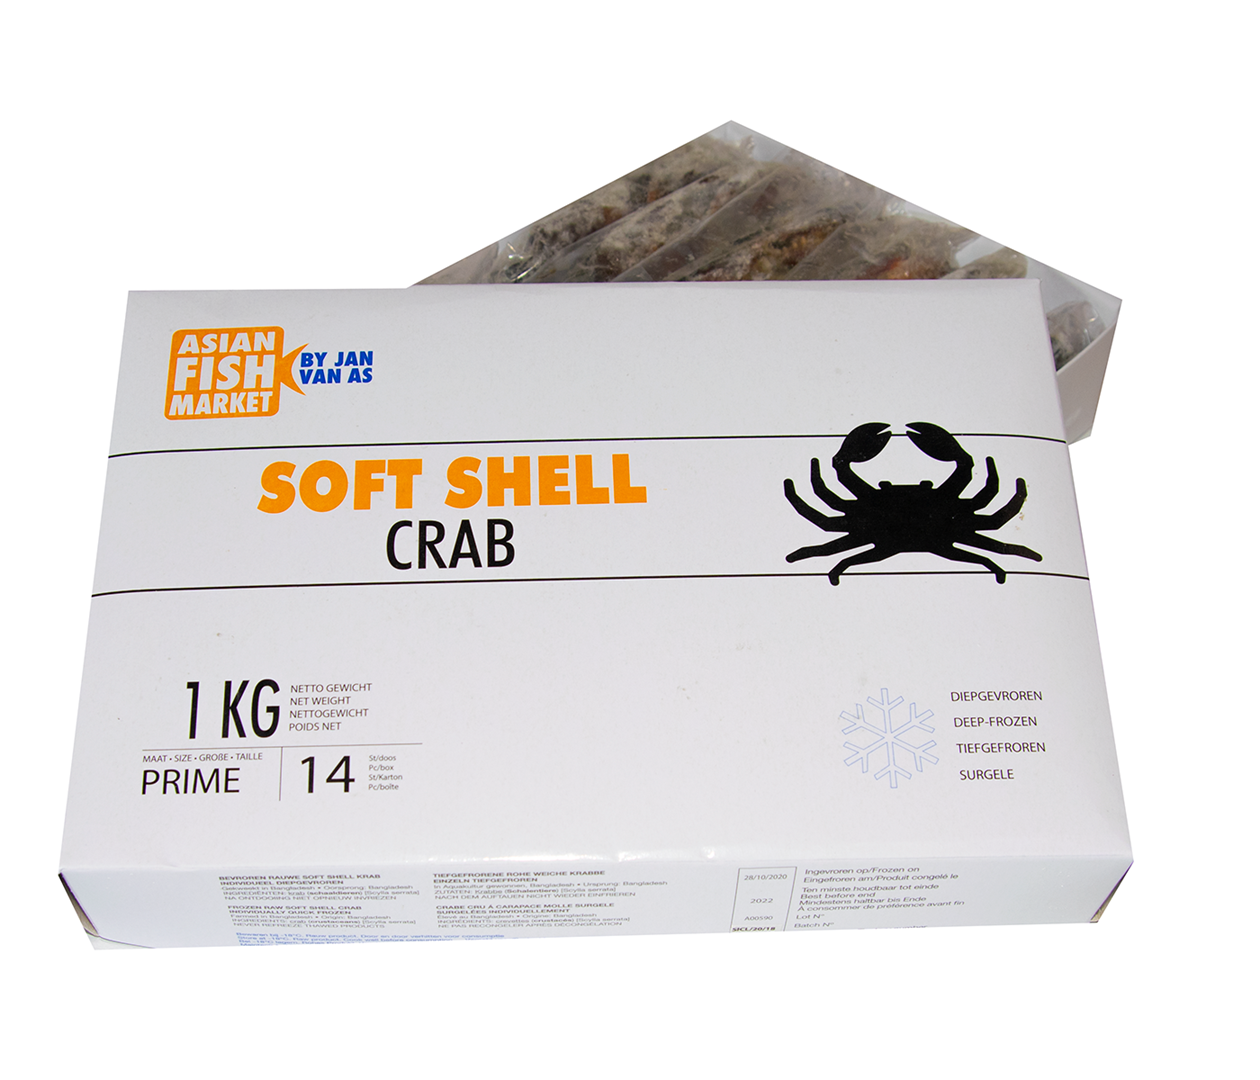 Productafbeelding CRAB SOFT SHELL PRIME 70-90, AFM 1KG FROZEN